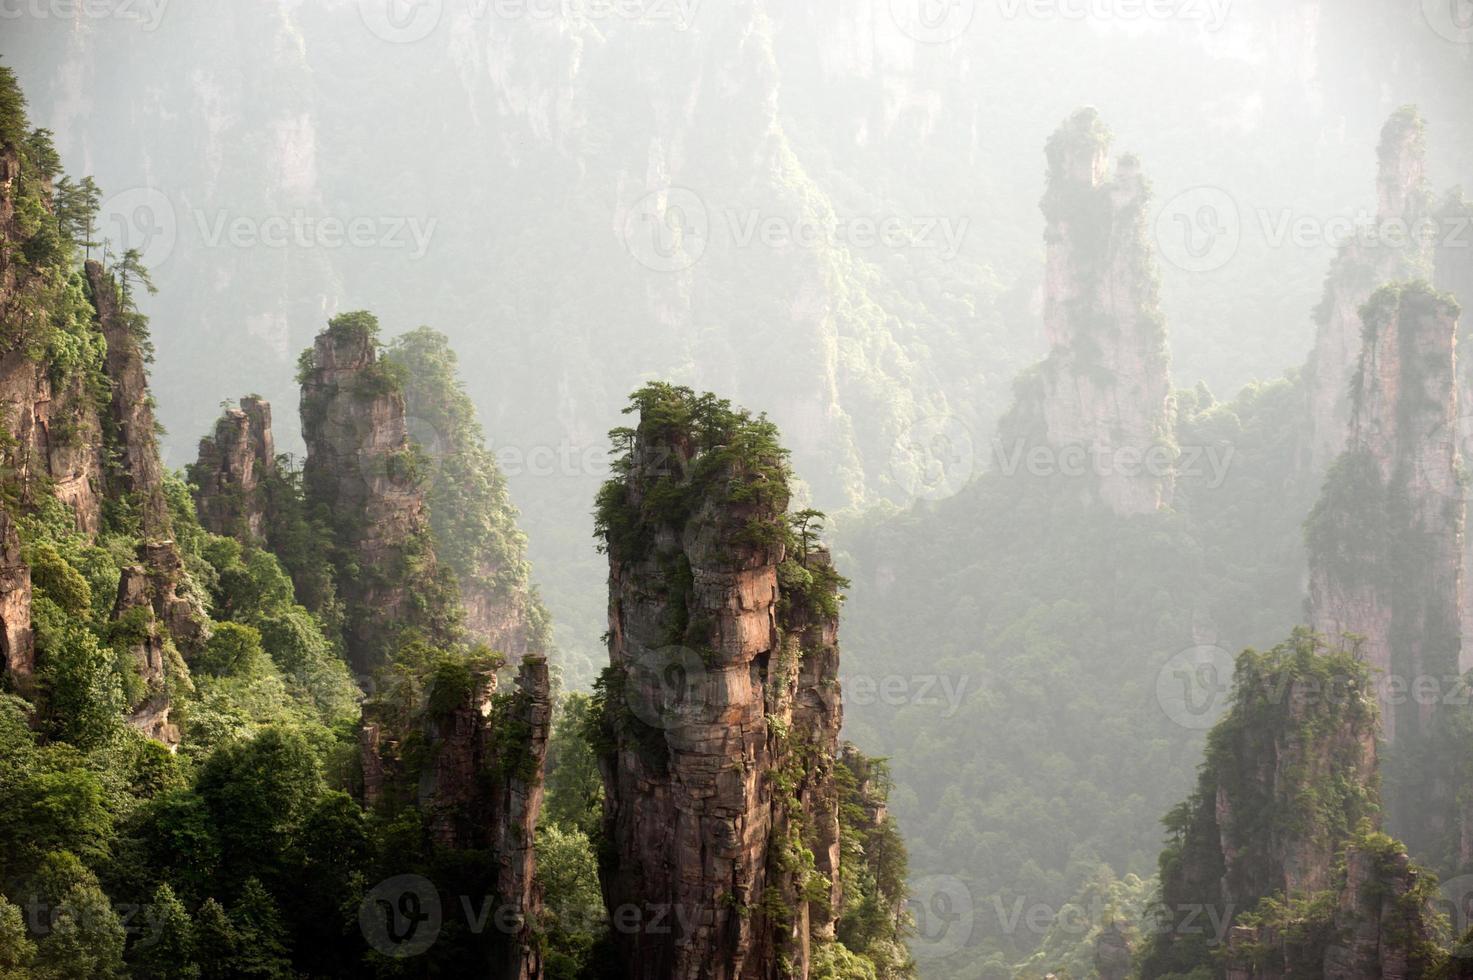 Wulingyuan Scenic Area part of Zhangjiajie National Forest Part. photo